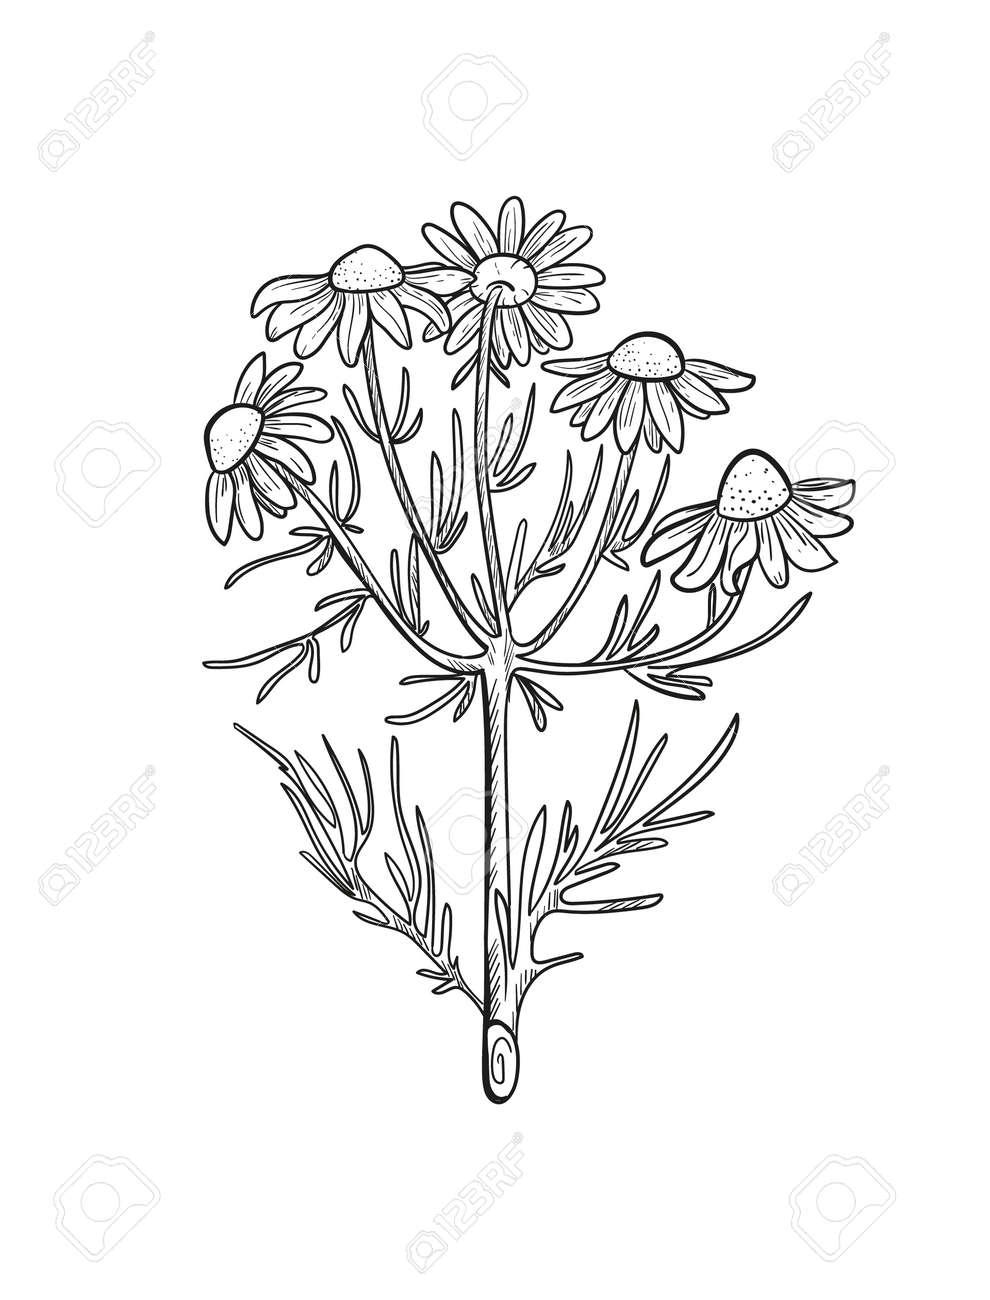 Vector chamomile sketch. Matricaria chamomilla medicinal plant hand drawn illustration. - 167208073